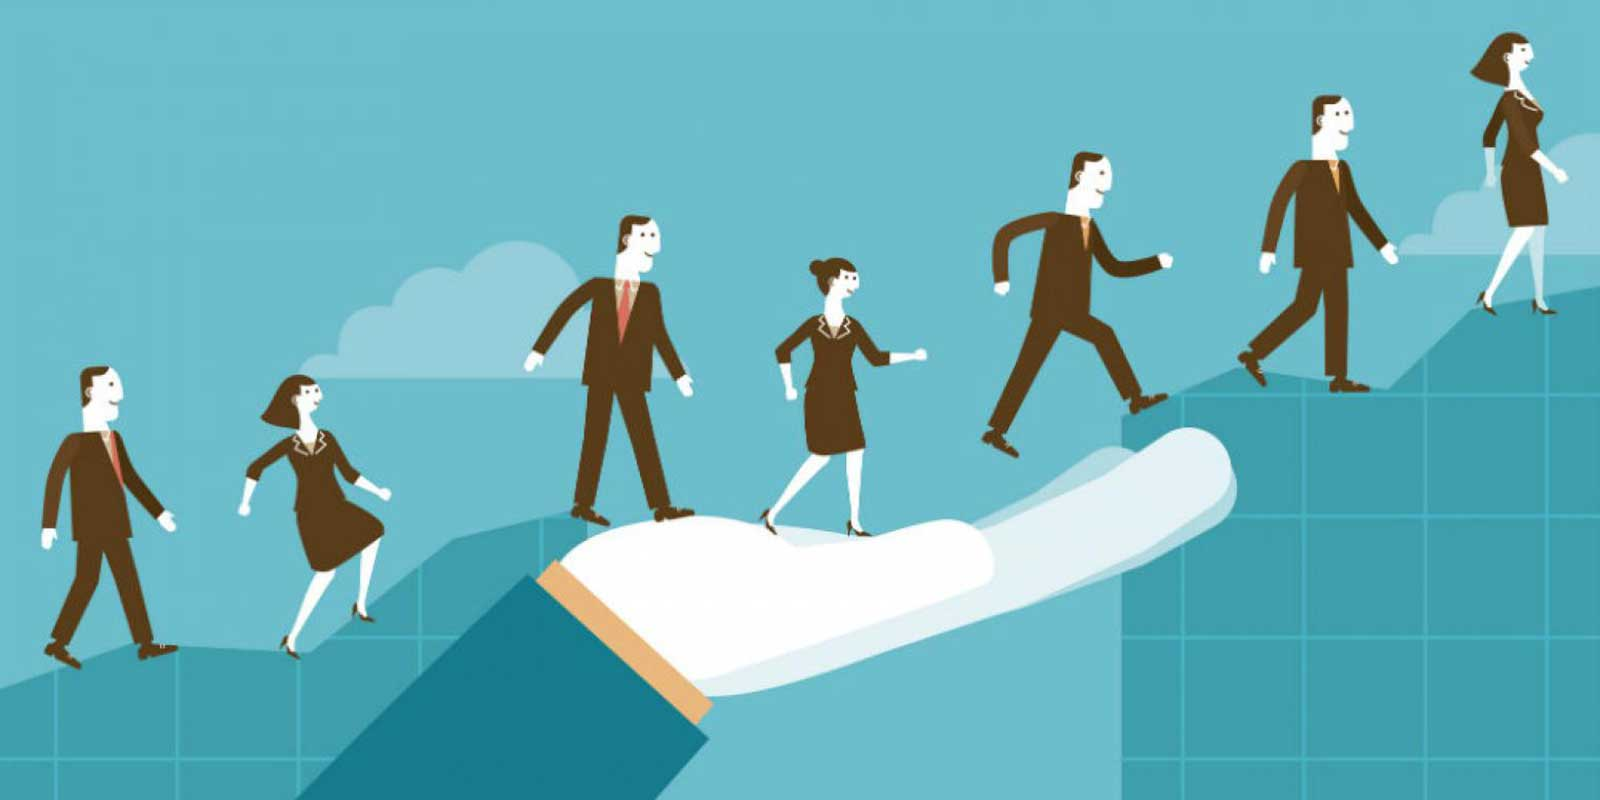 Succession Planning for Privateley Held Companies   ButcherJoseph & Co.